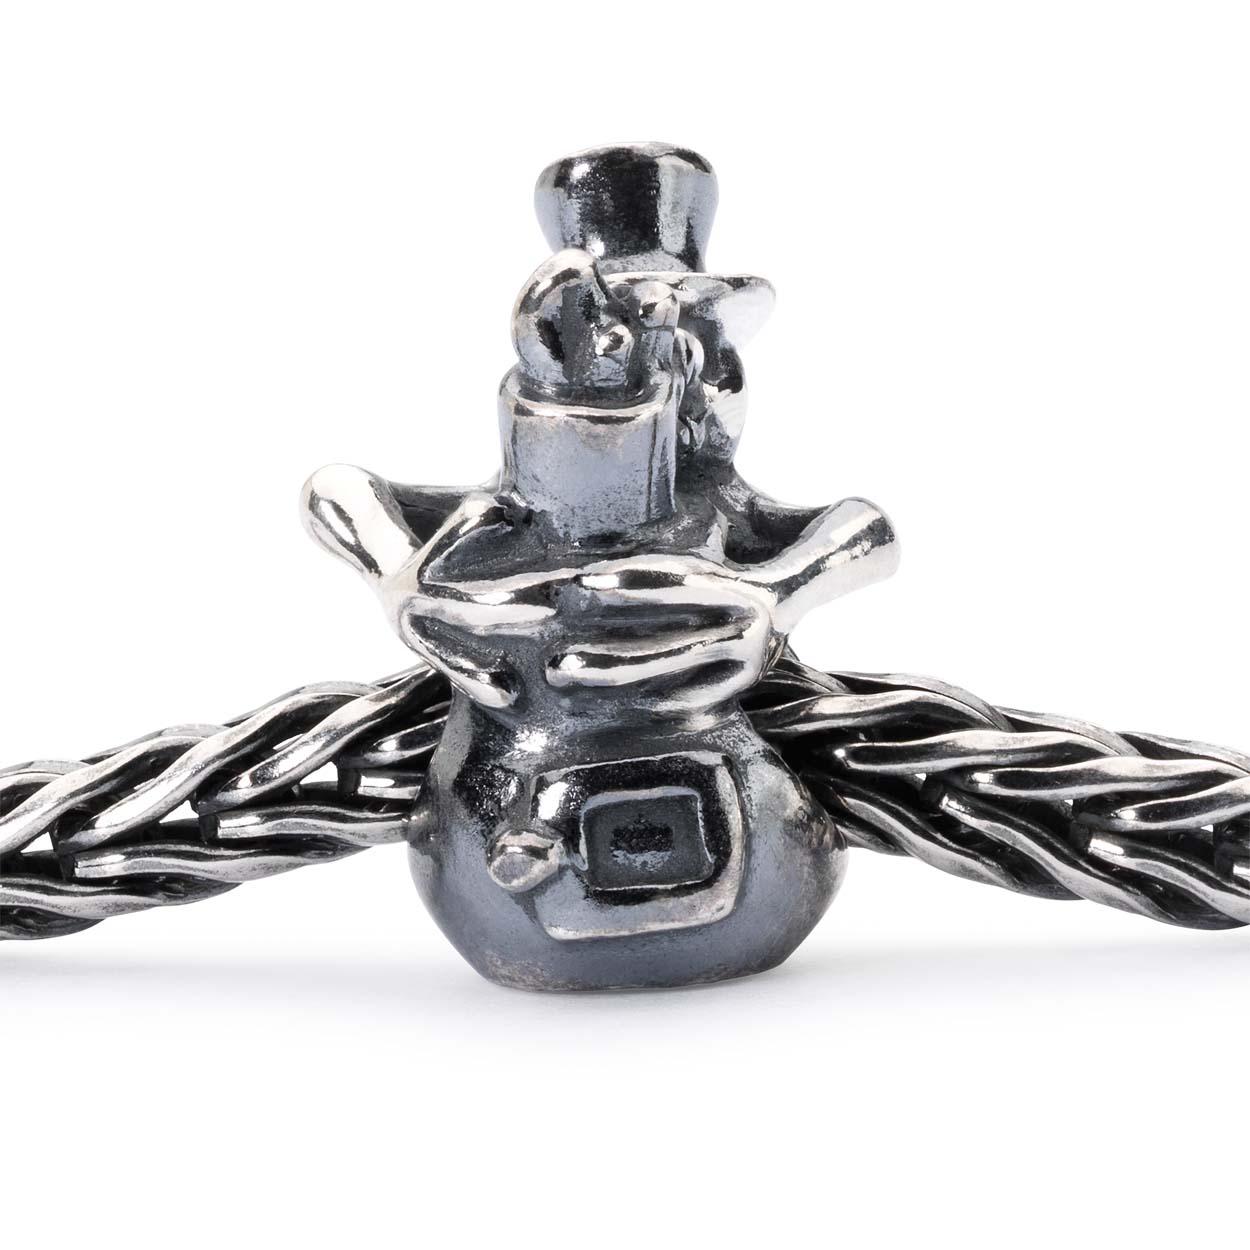 TAGBE-30124 Snowman Frost & Lady Thaw chain